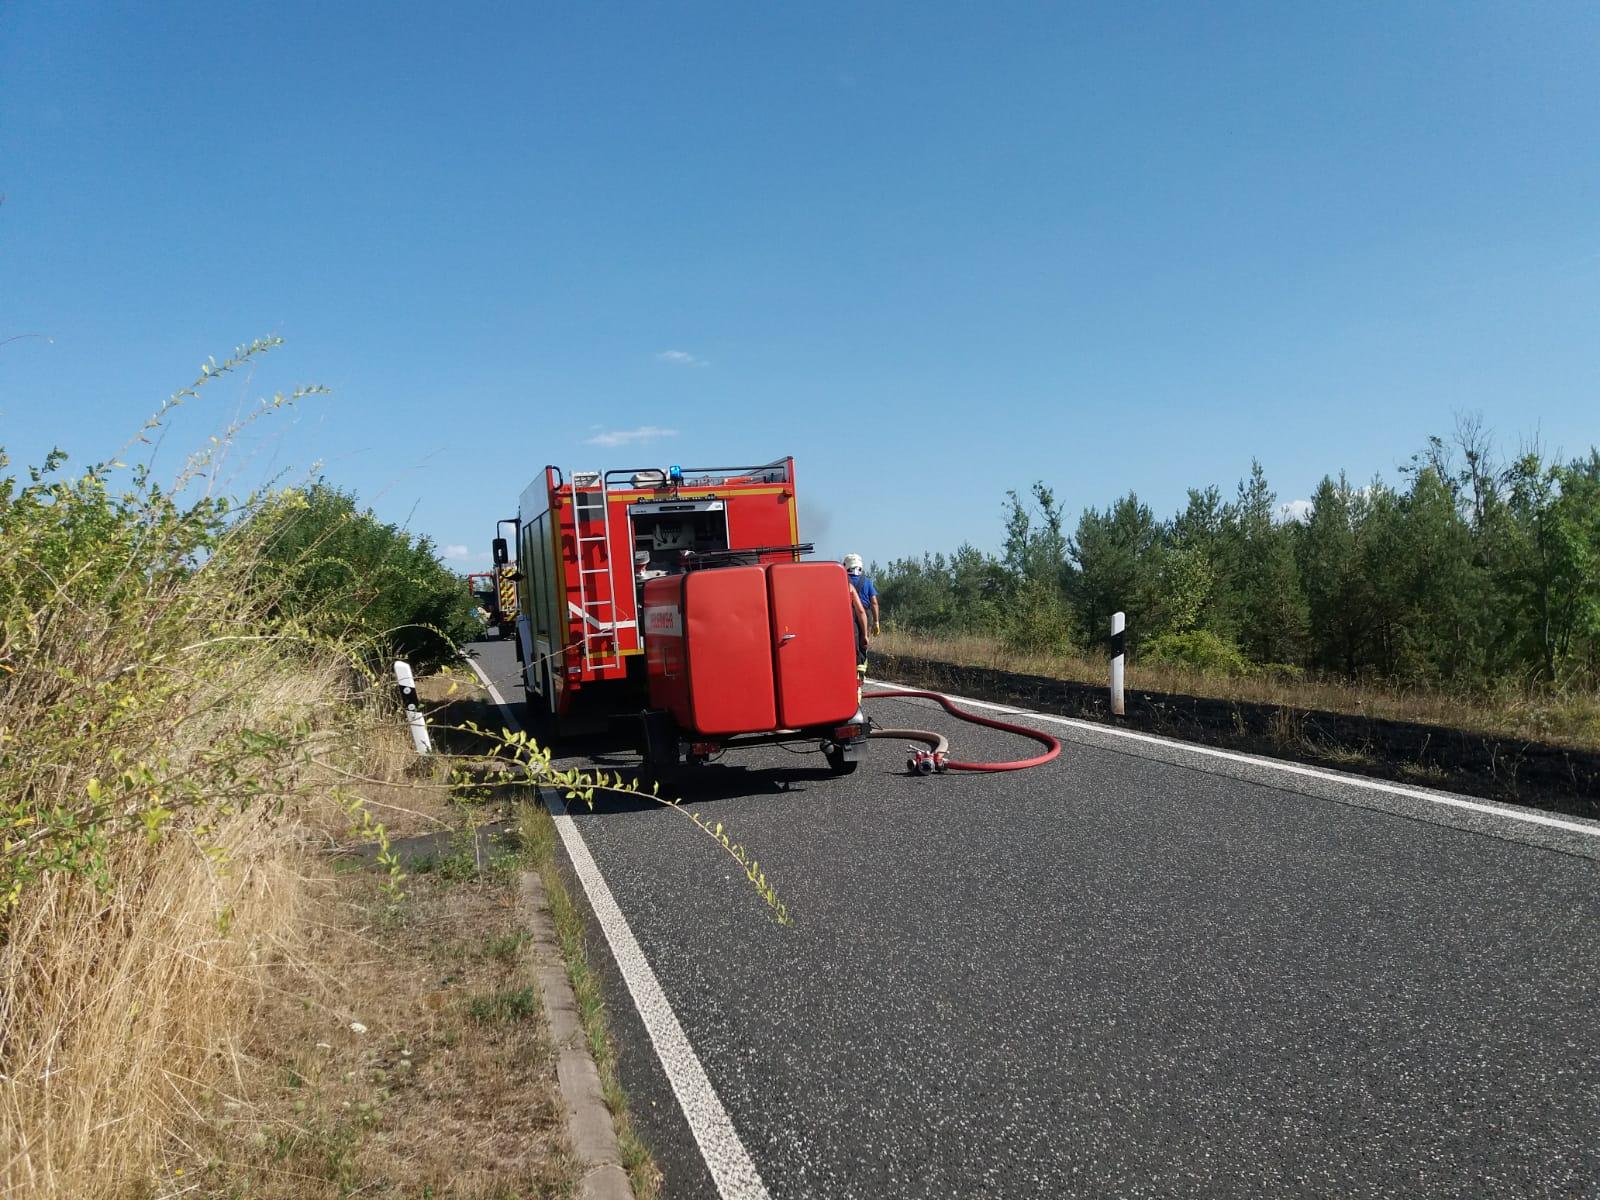 26.07.2018 Flächenbrand am kl. Hörselberg